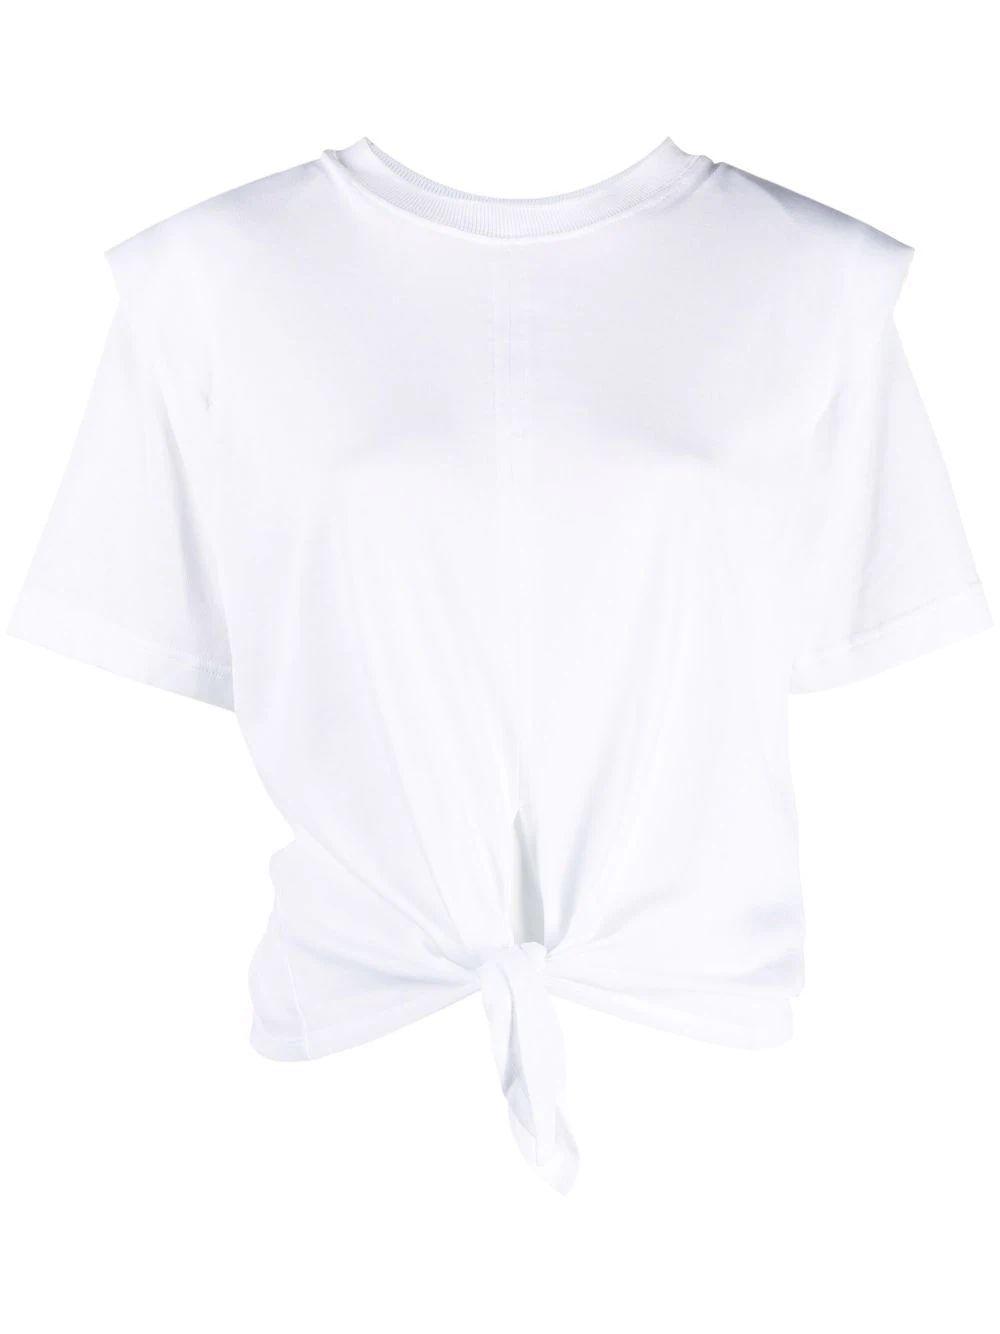 Zelikia Knot Front T- Shirt Item # ZELIKIA